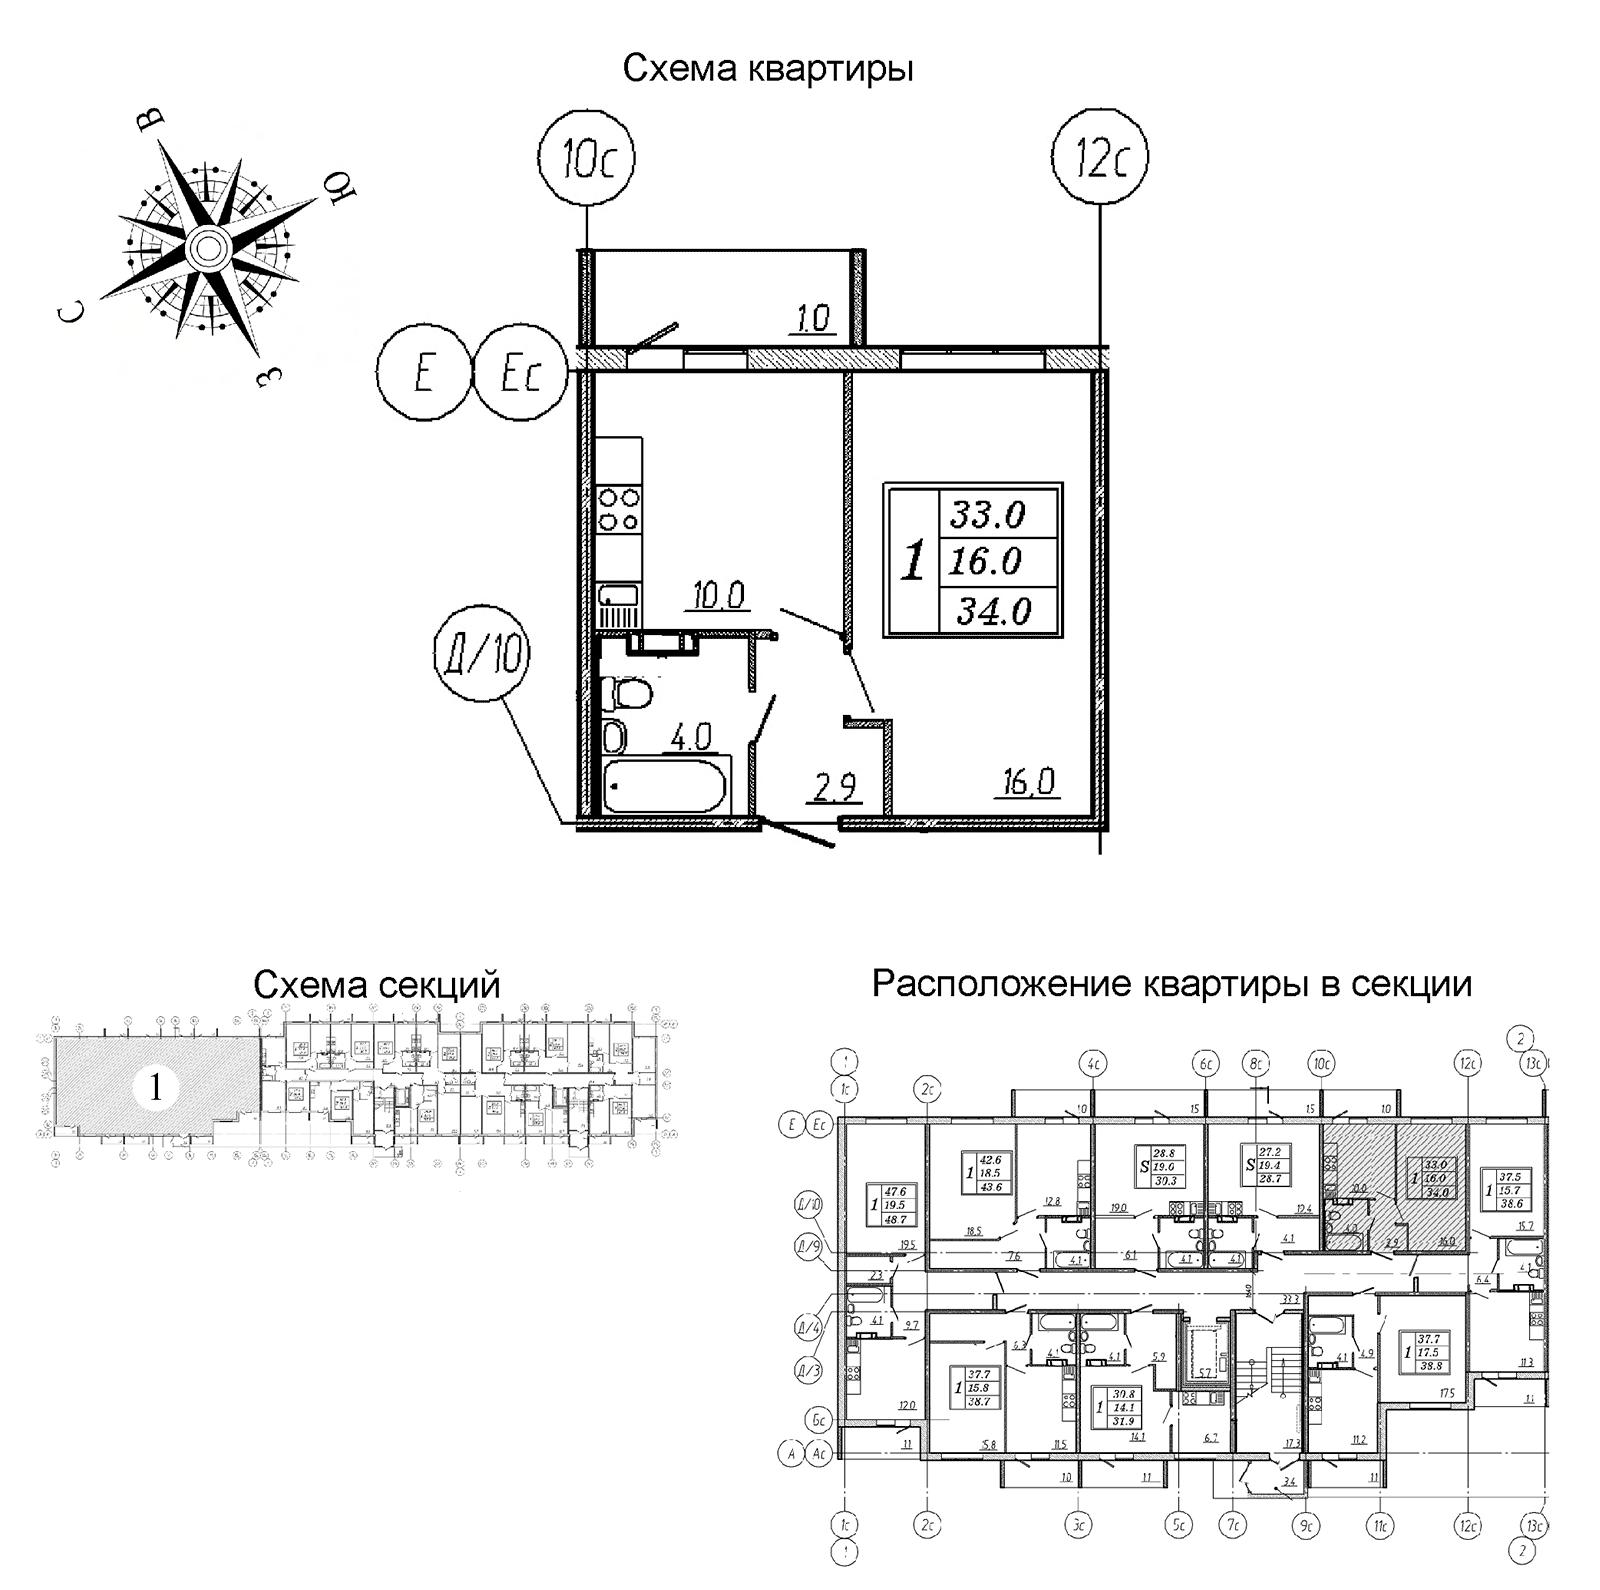 Однокомнатная квартира 34,3 м2